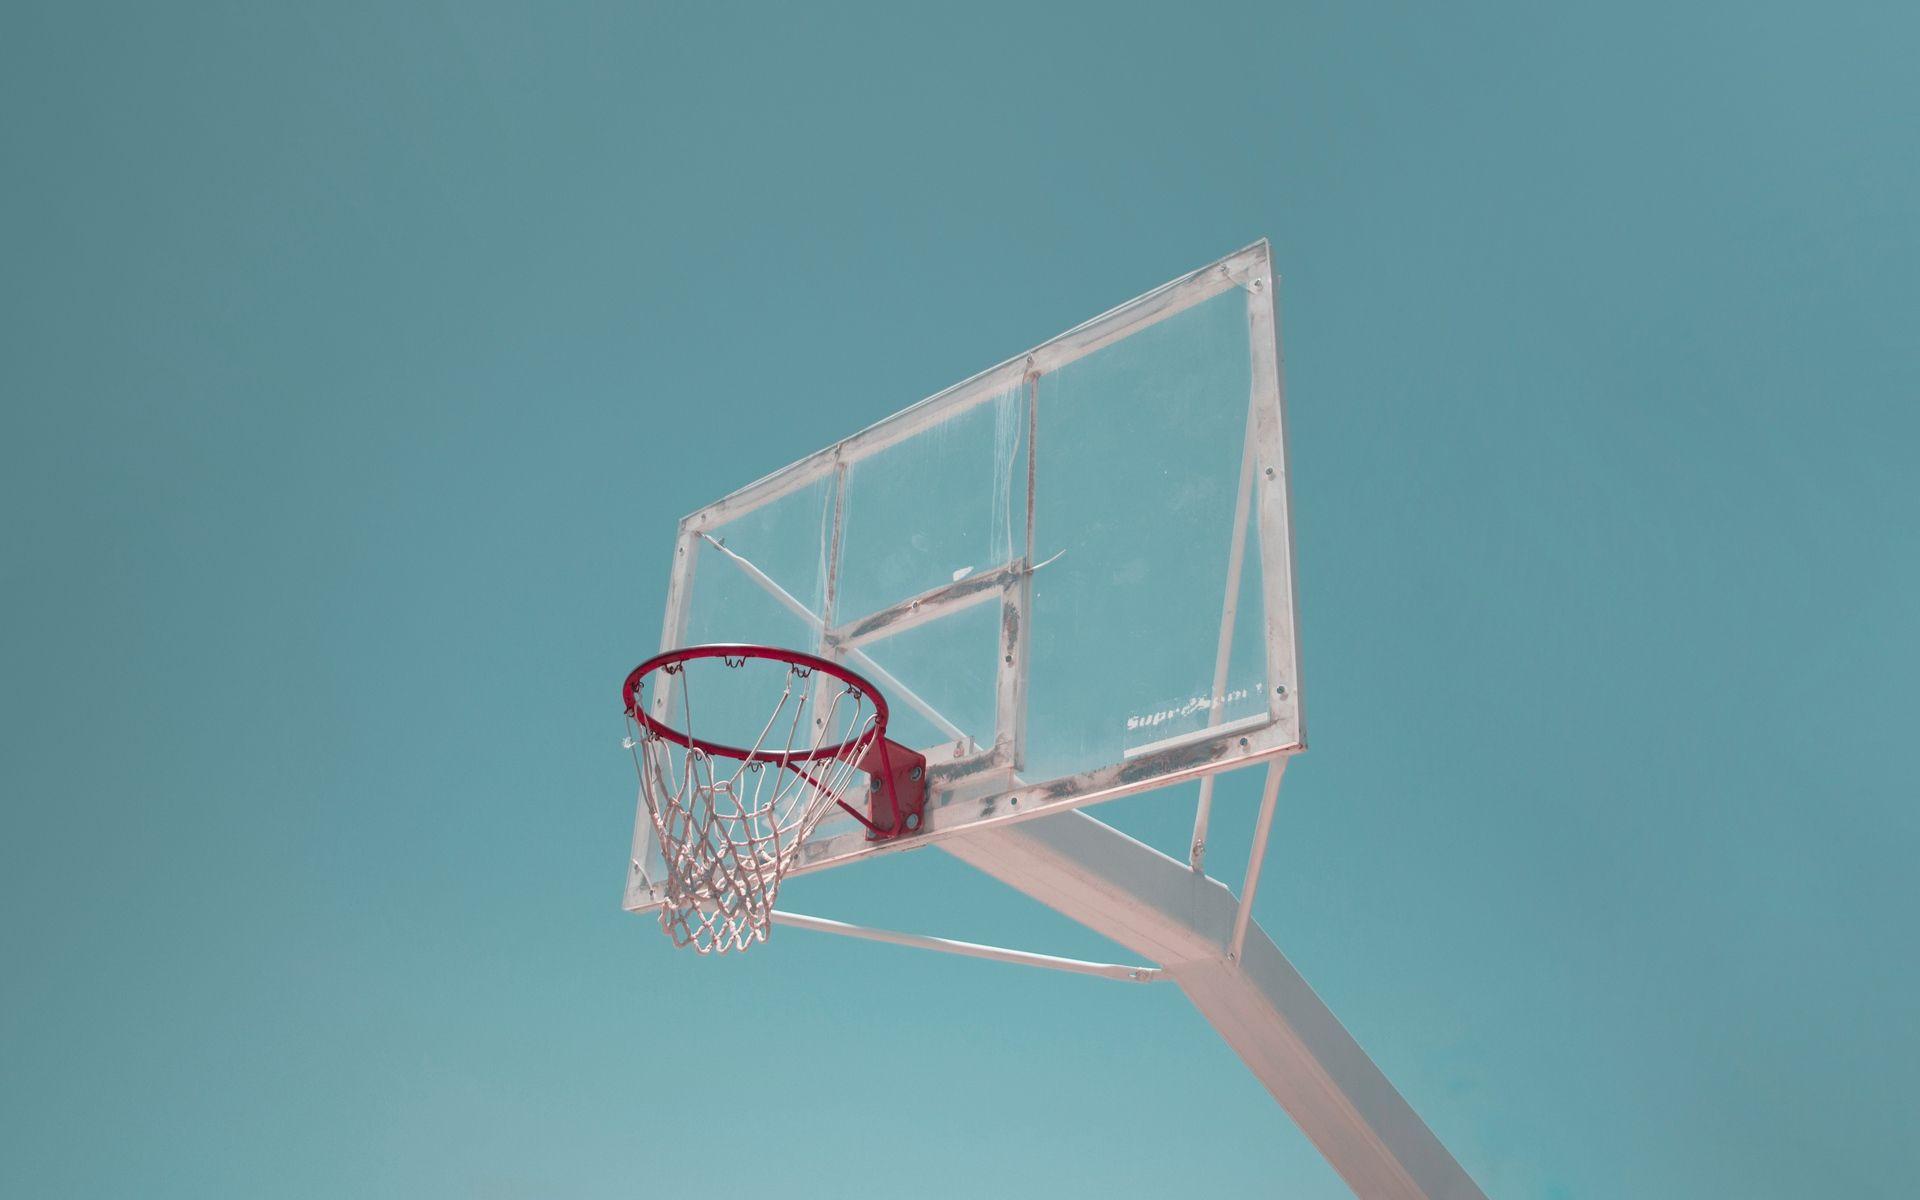 Basketball Ring Height Hd Wallpaper Basketball Ring Basketball